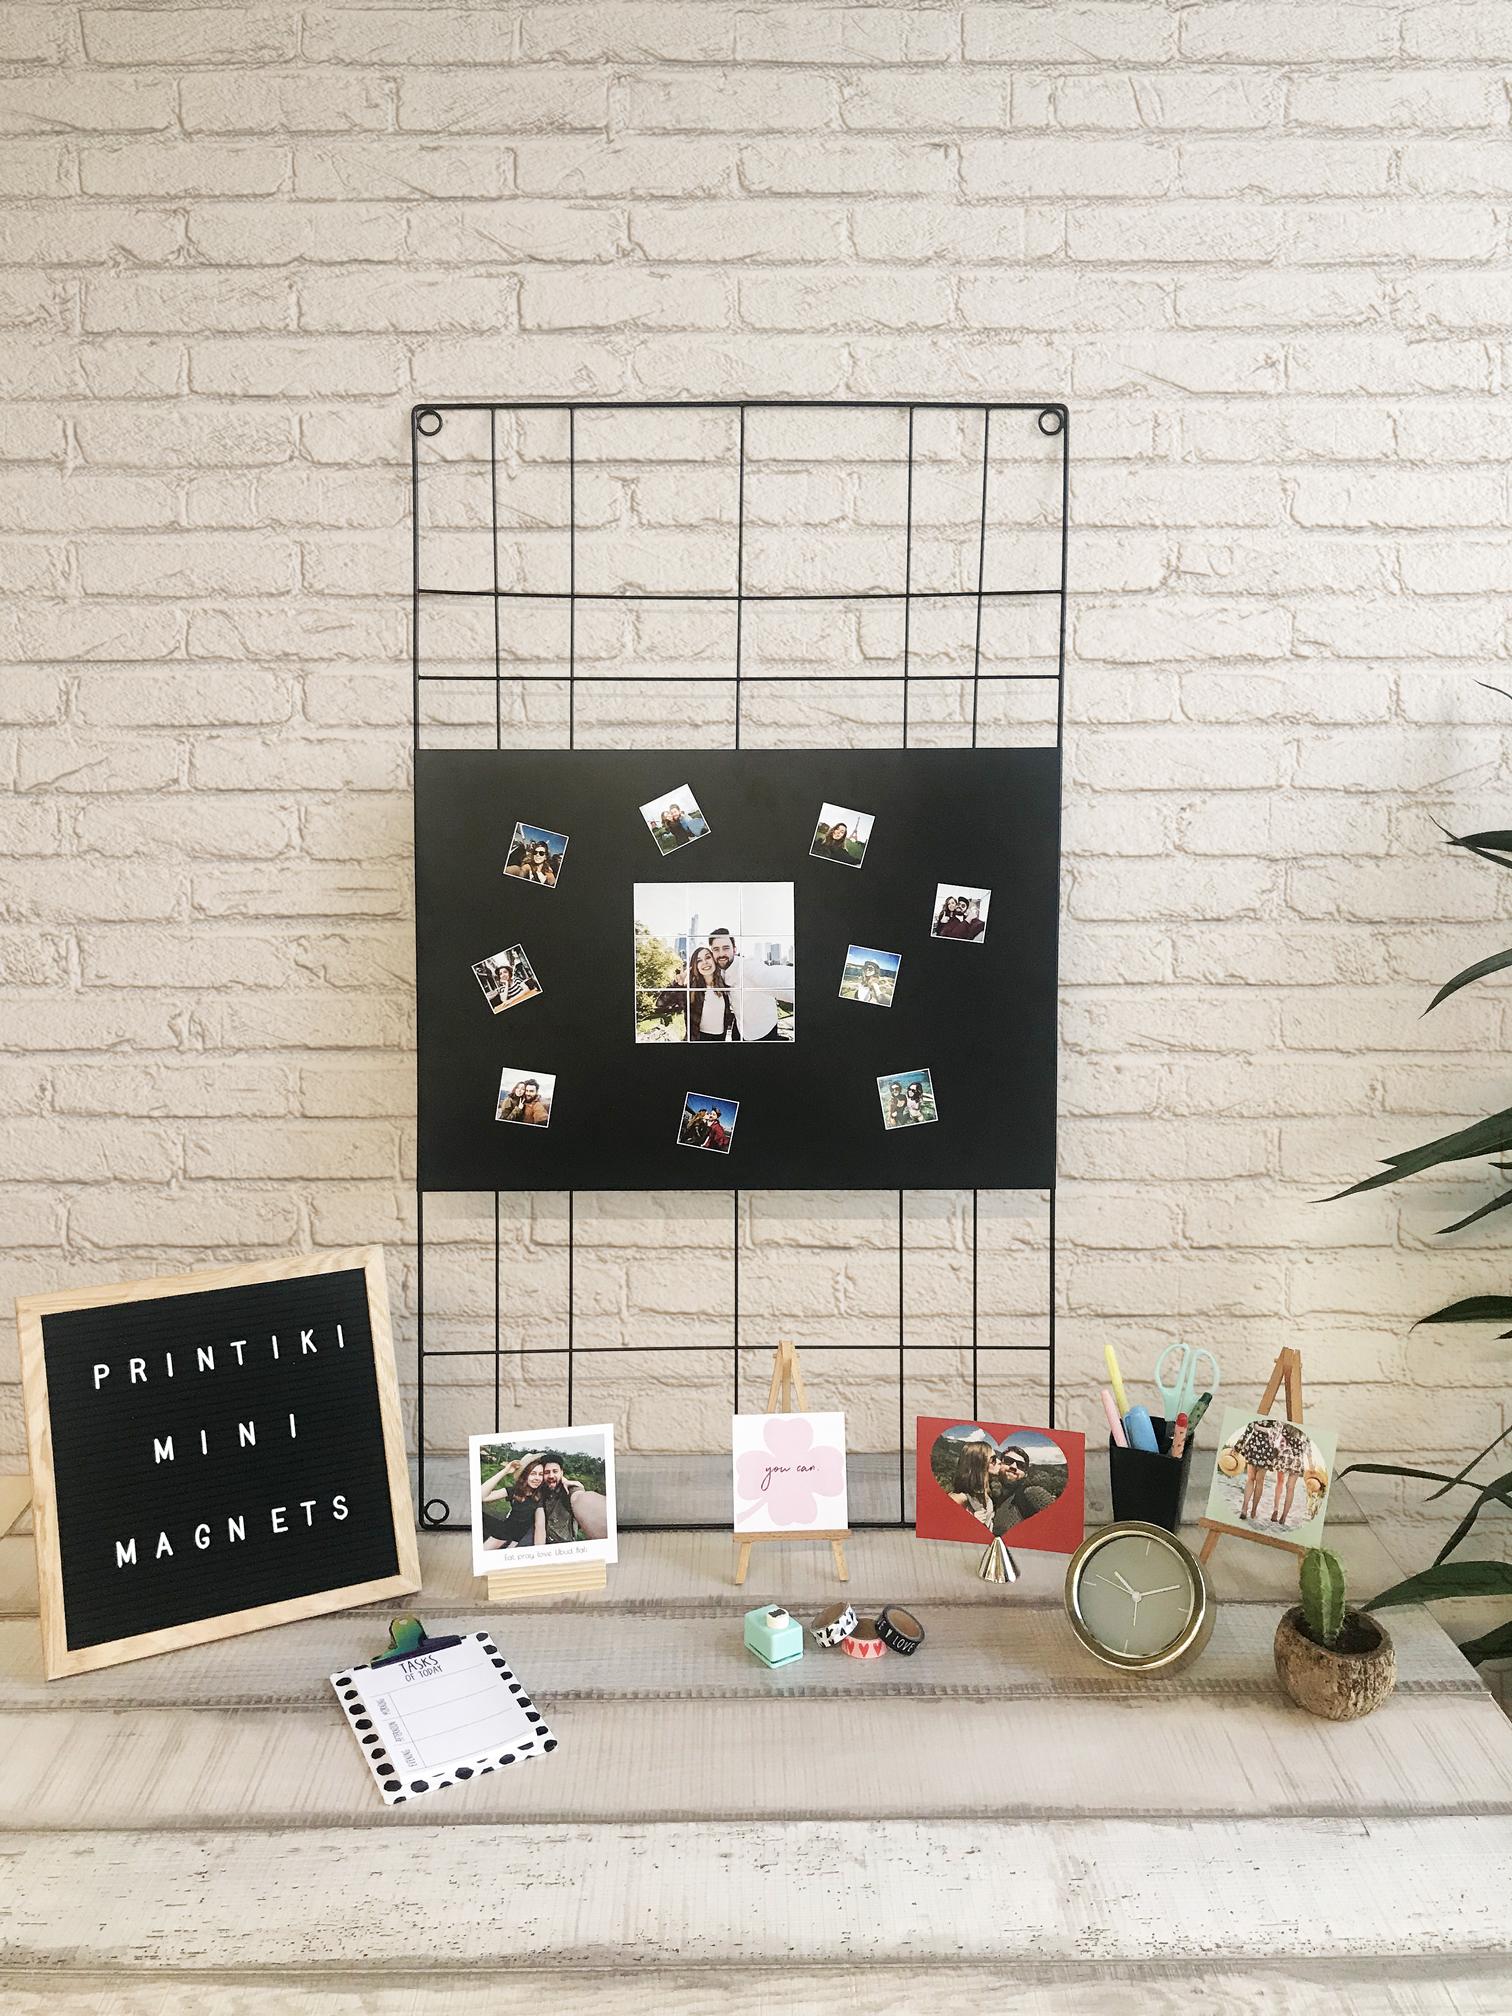 MINI-5-Magnets-Home-decor.jpg